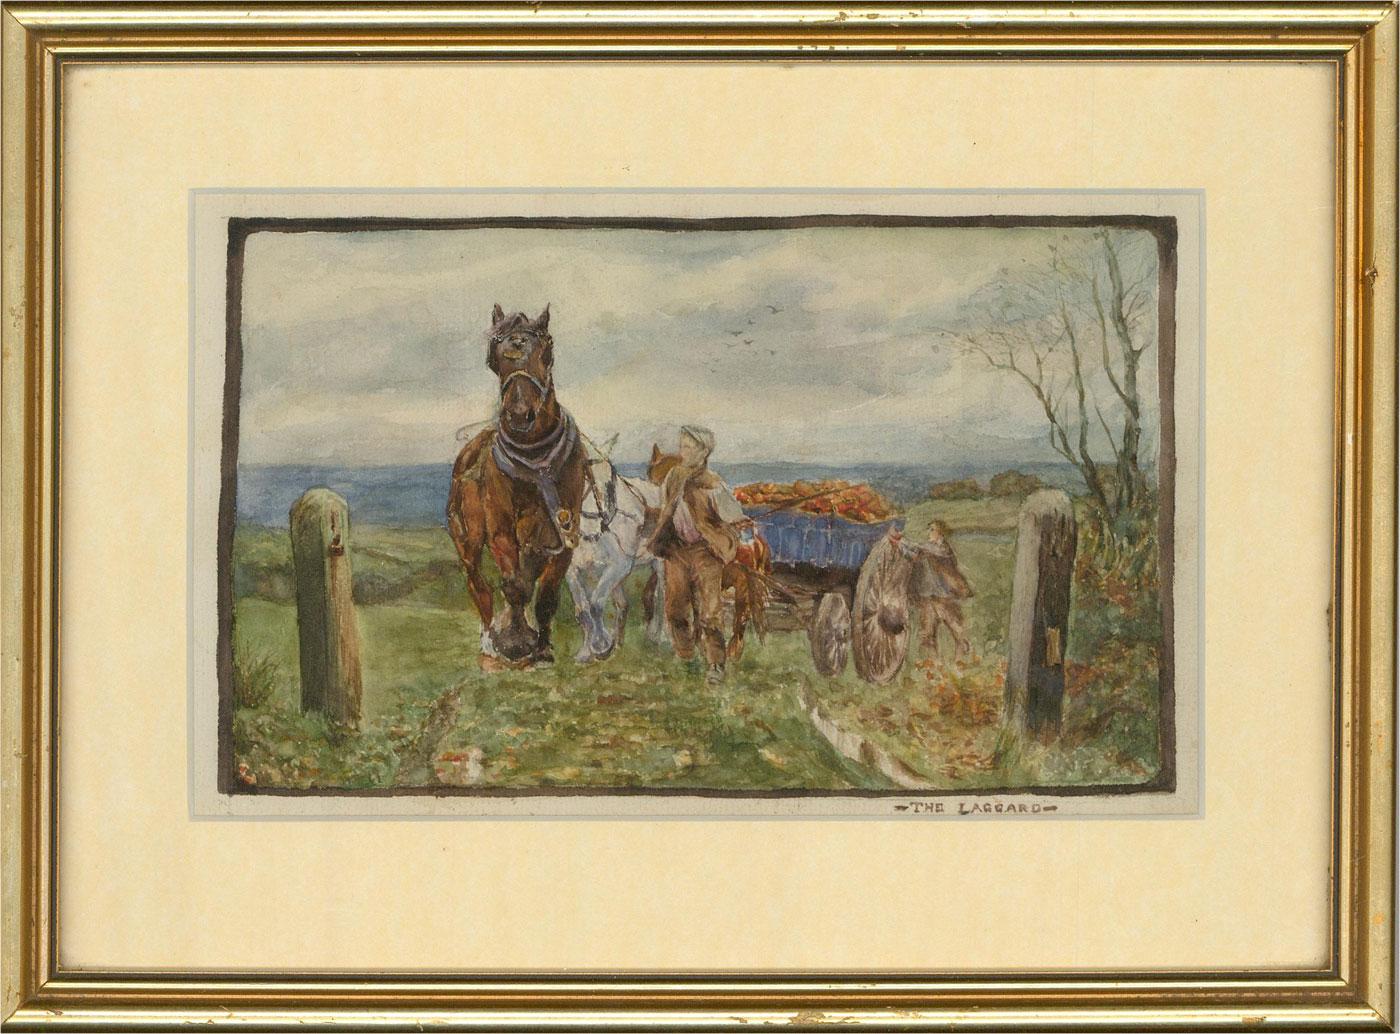 Late 19th Century Watercolour - The Laggard